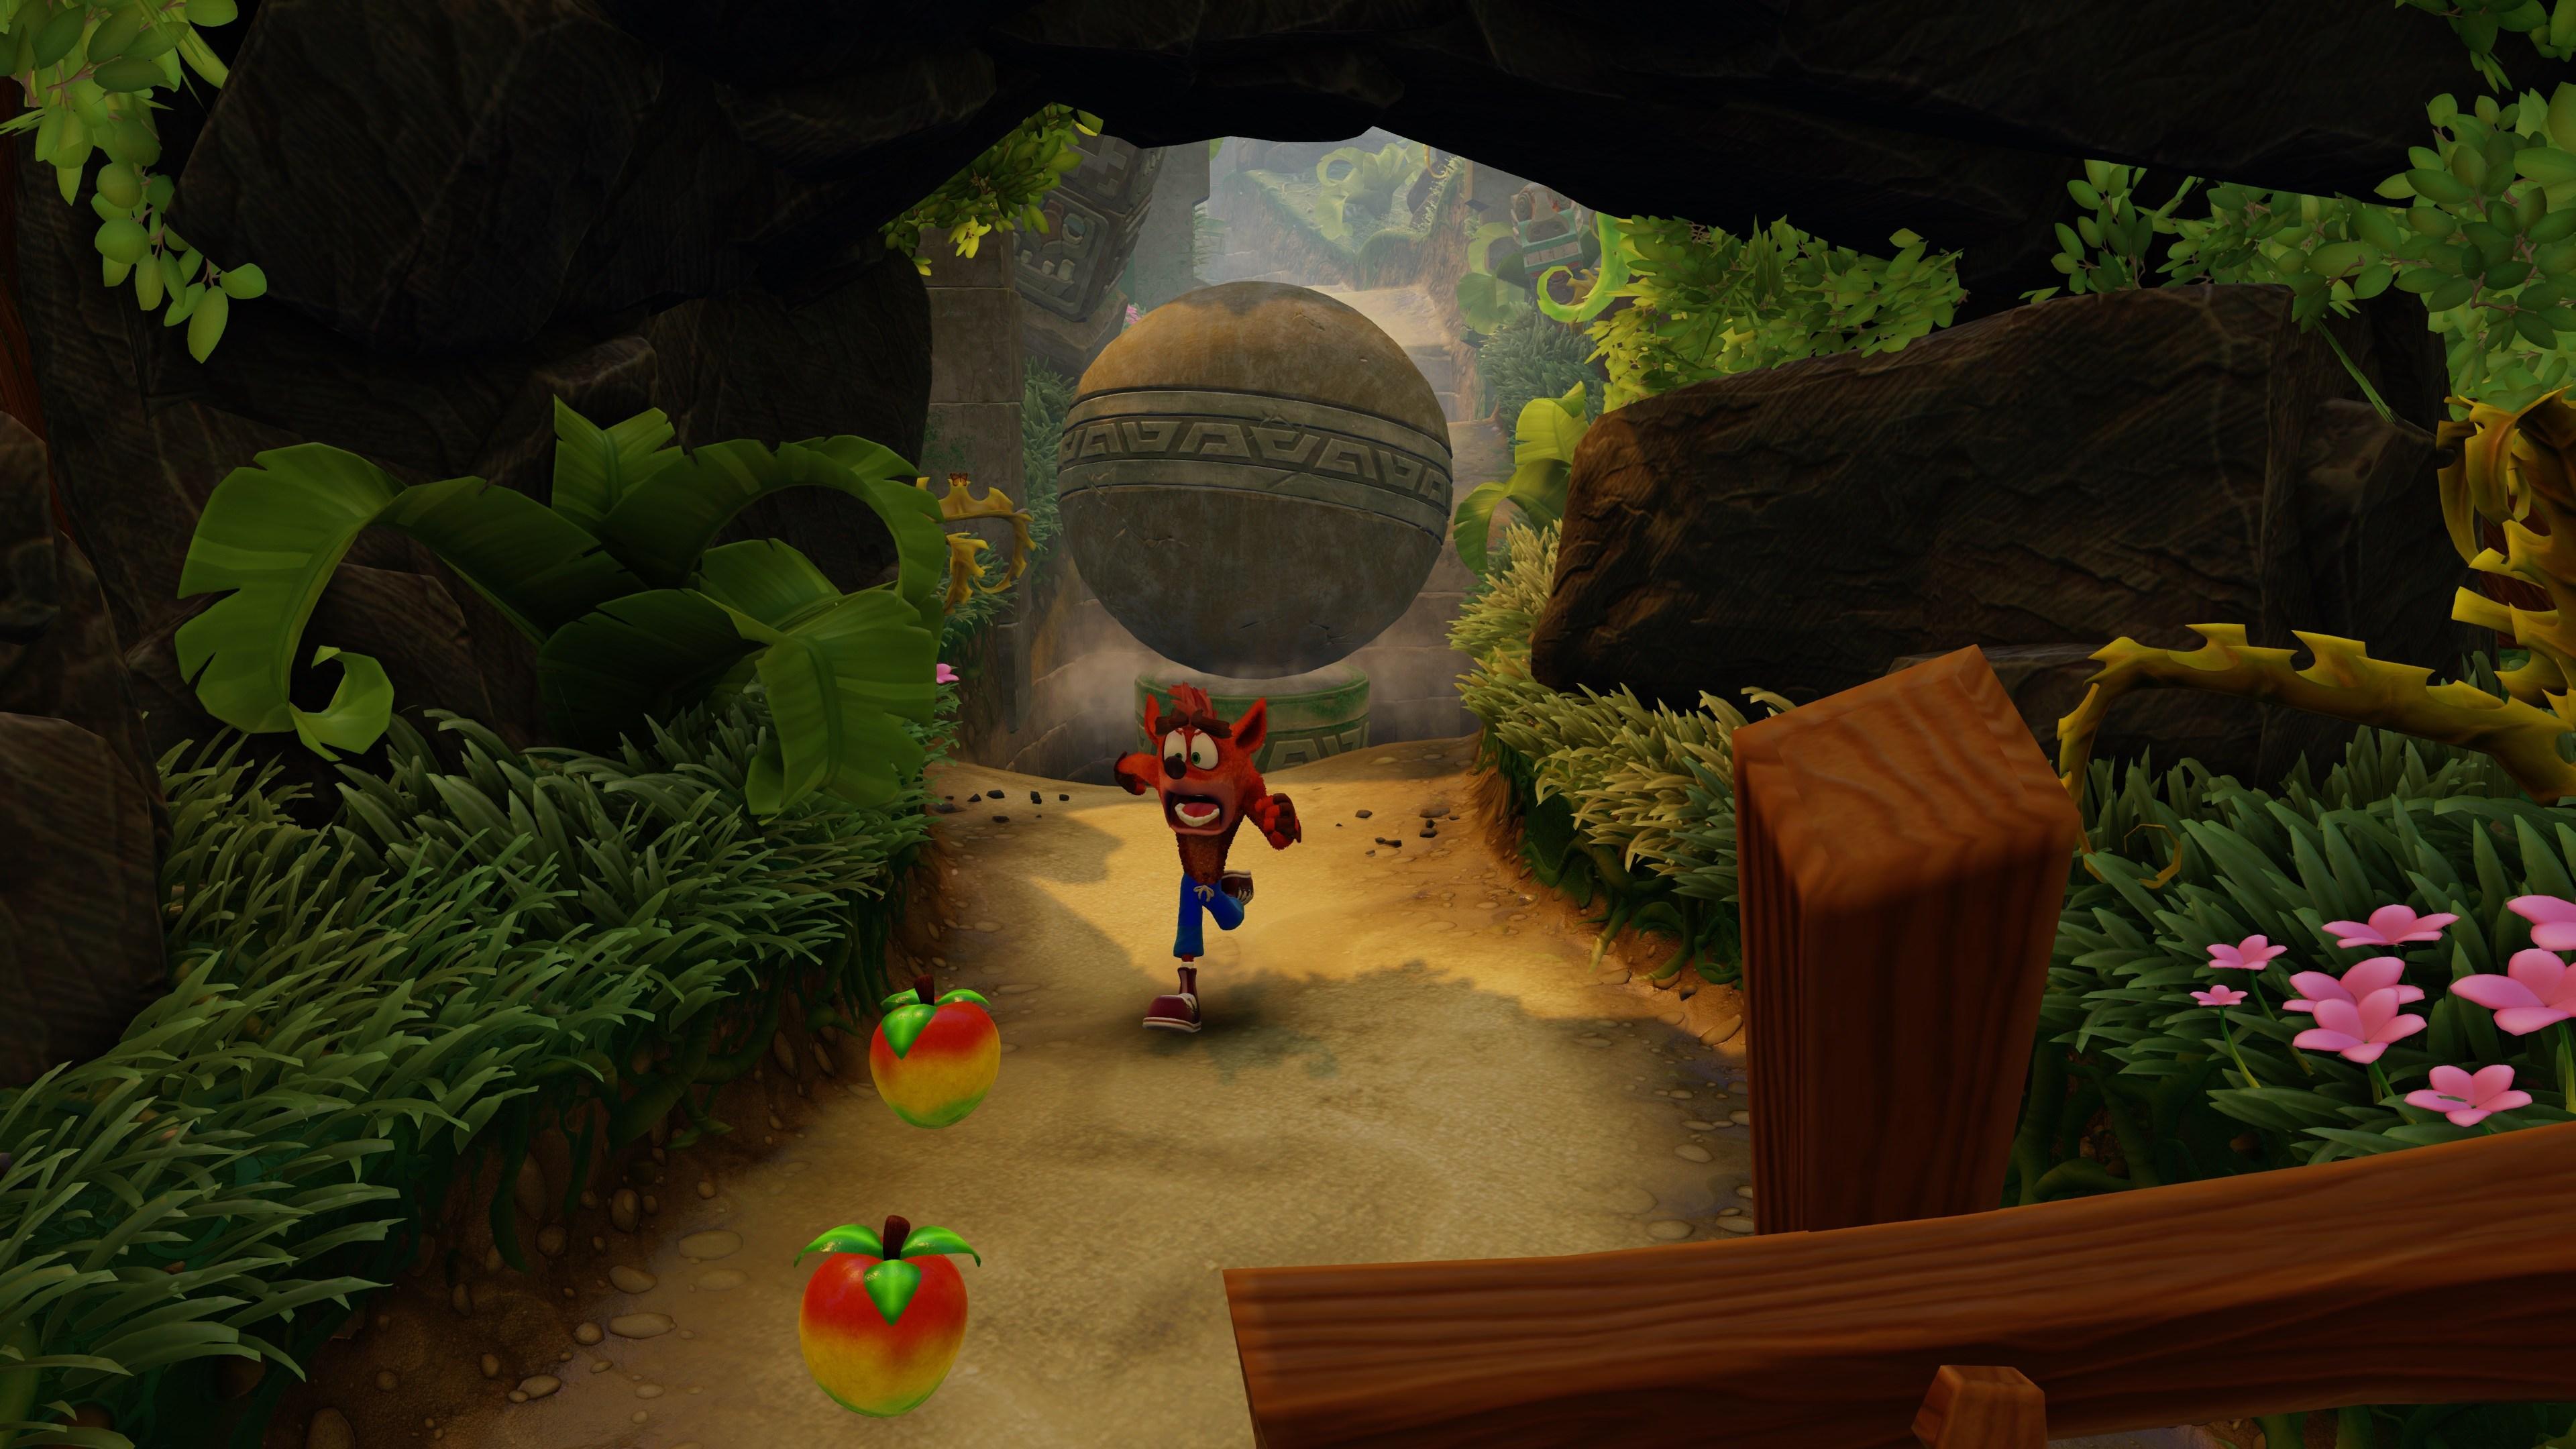 Crash Bandicoot - Crash Bandicoot N. Sane Trilogy 4K